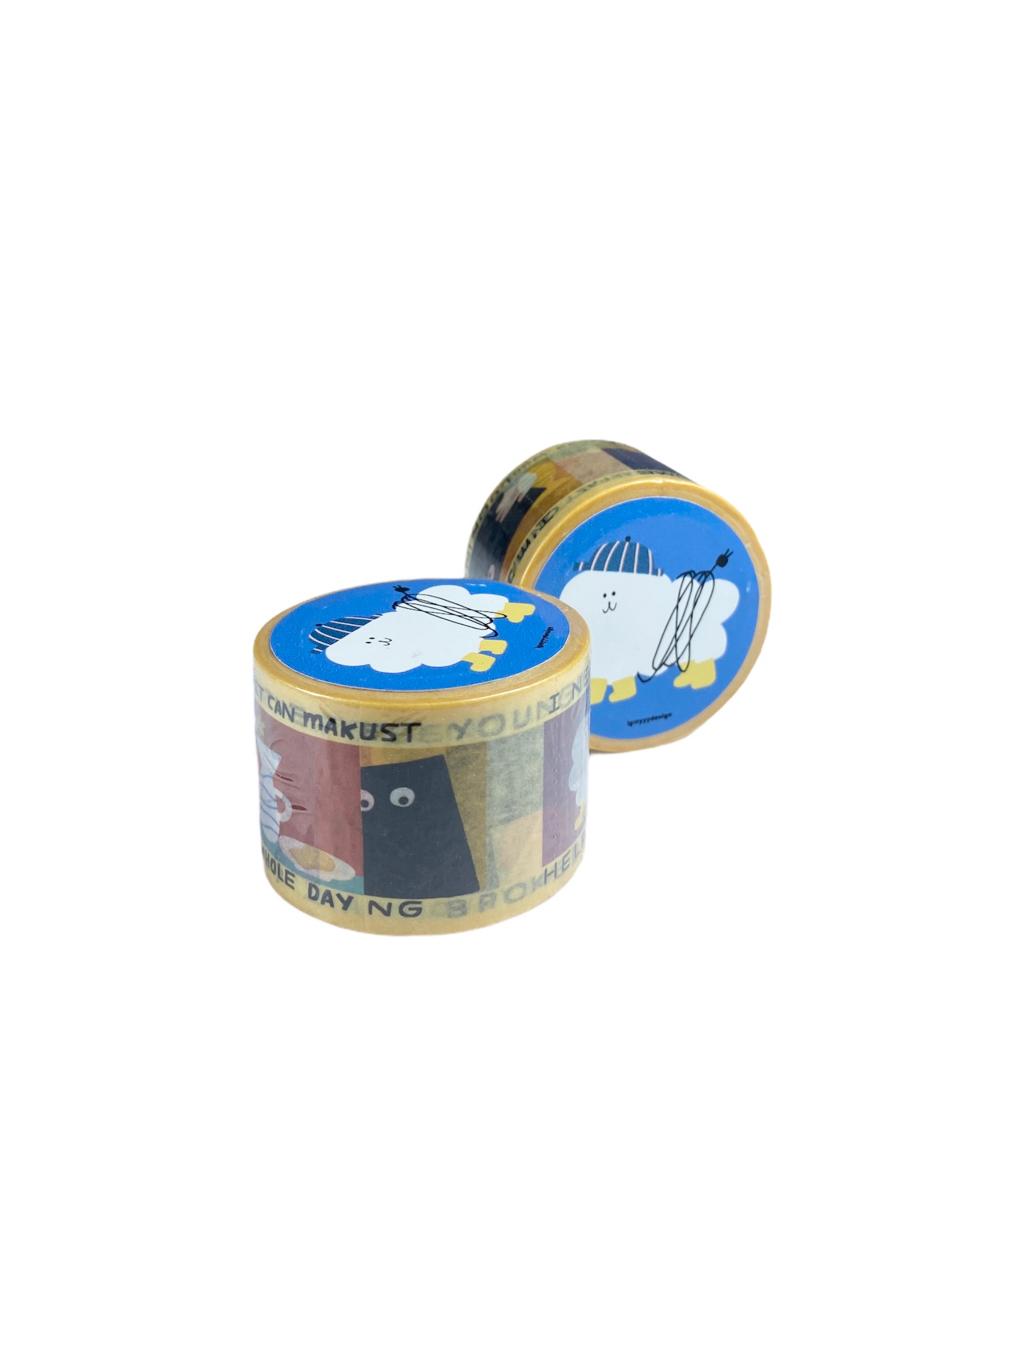 Masking Tape - White Dog